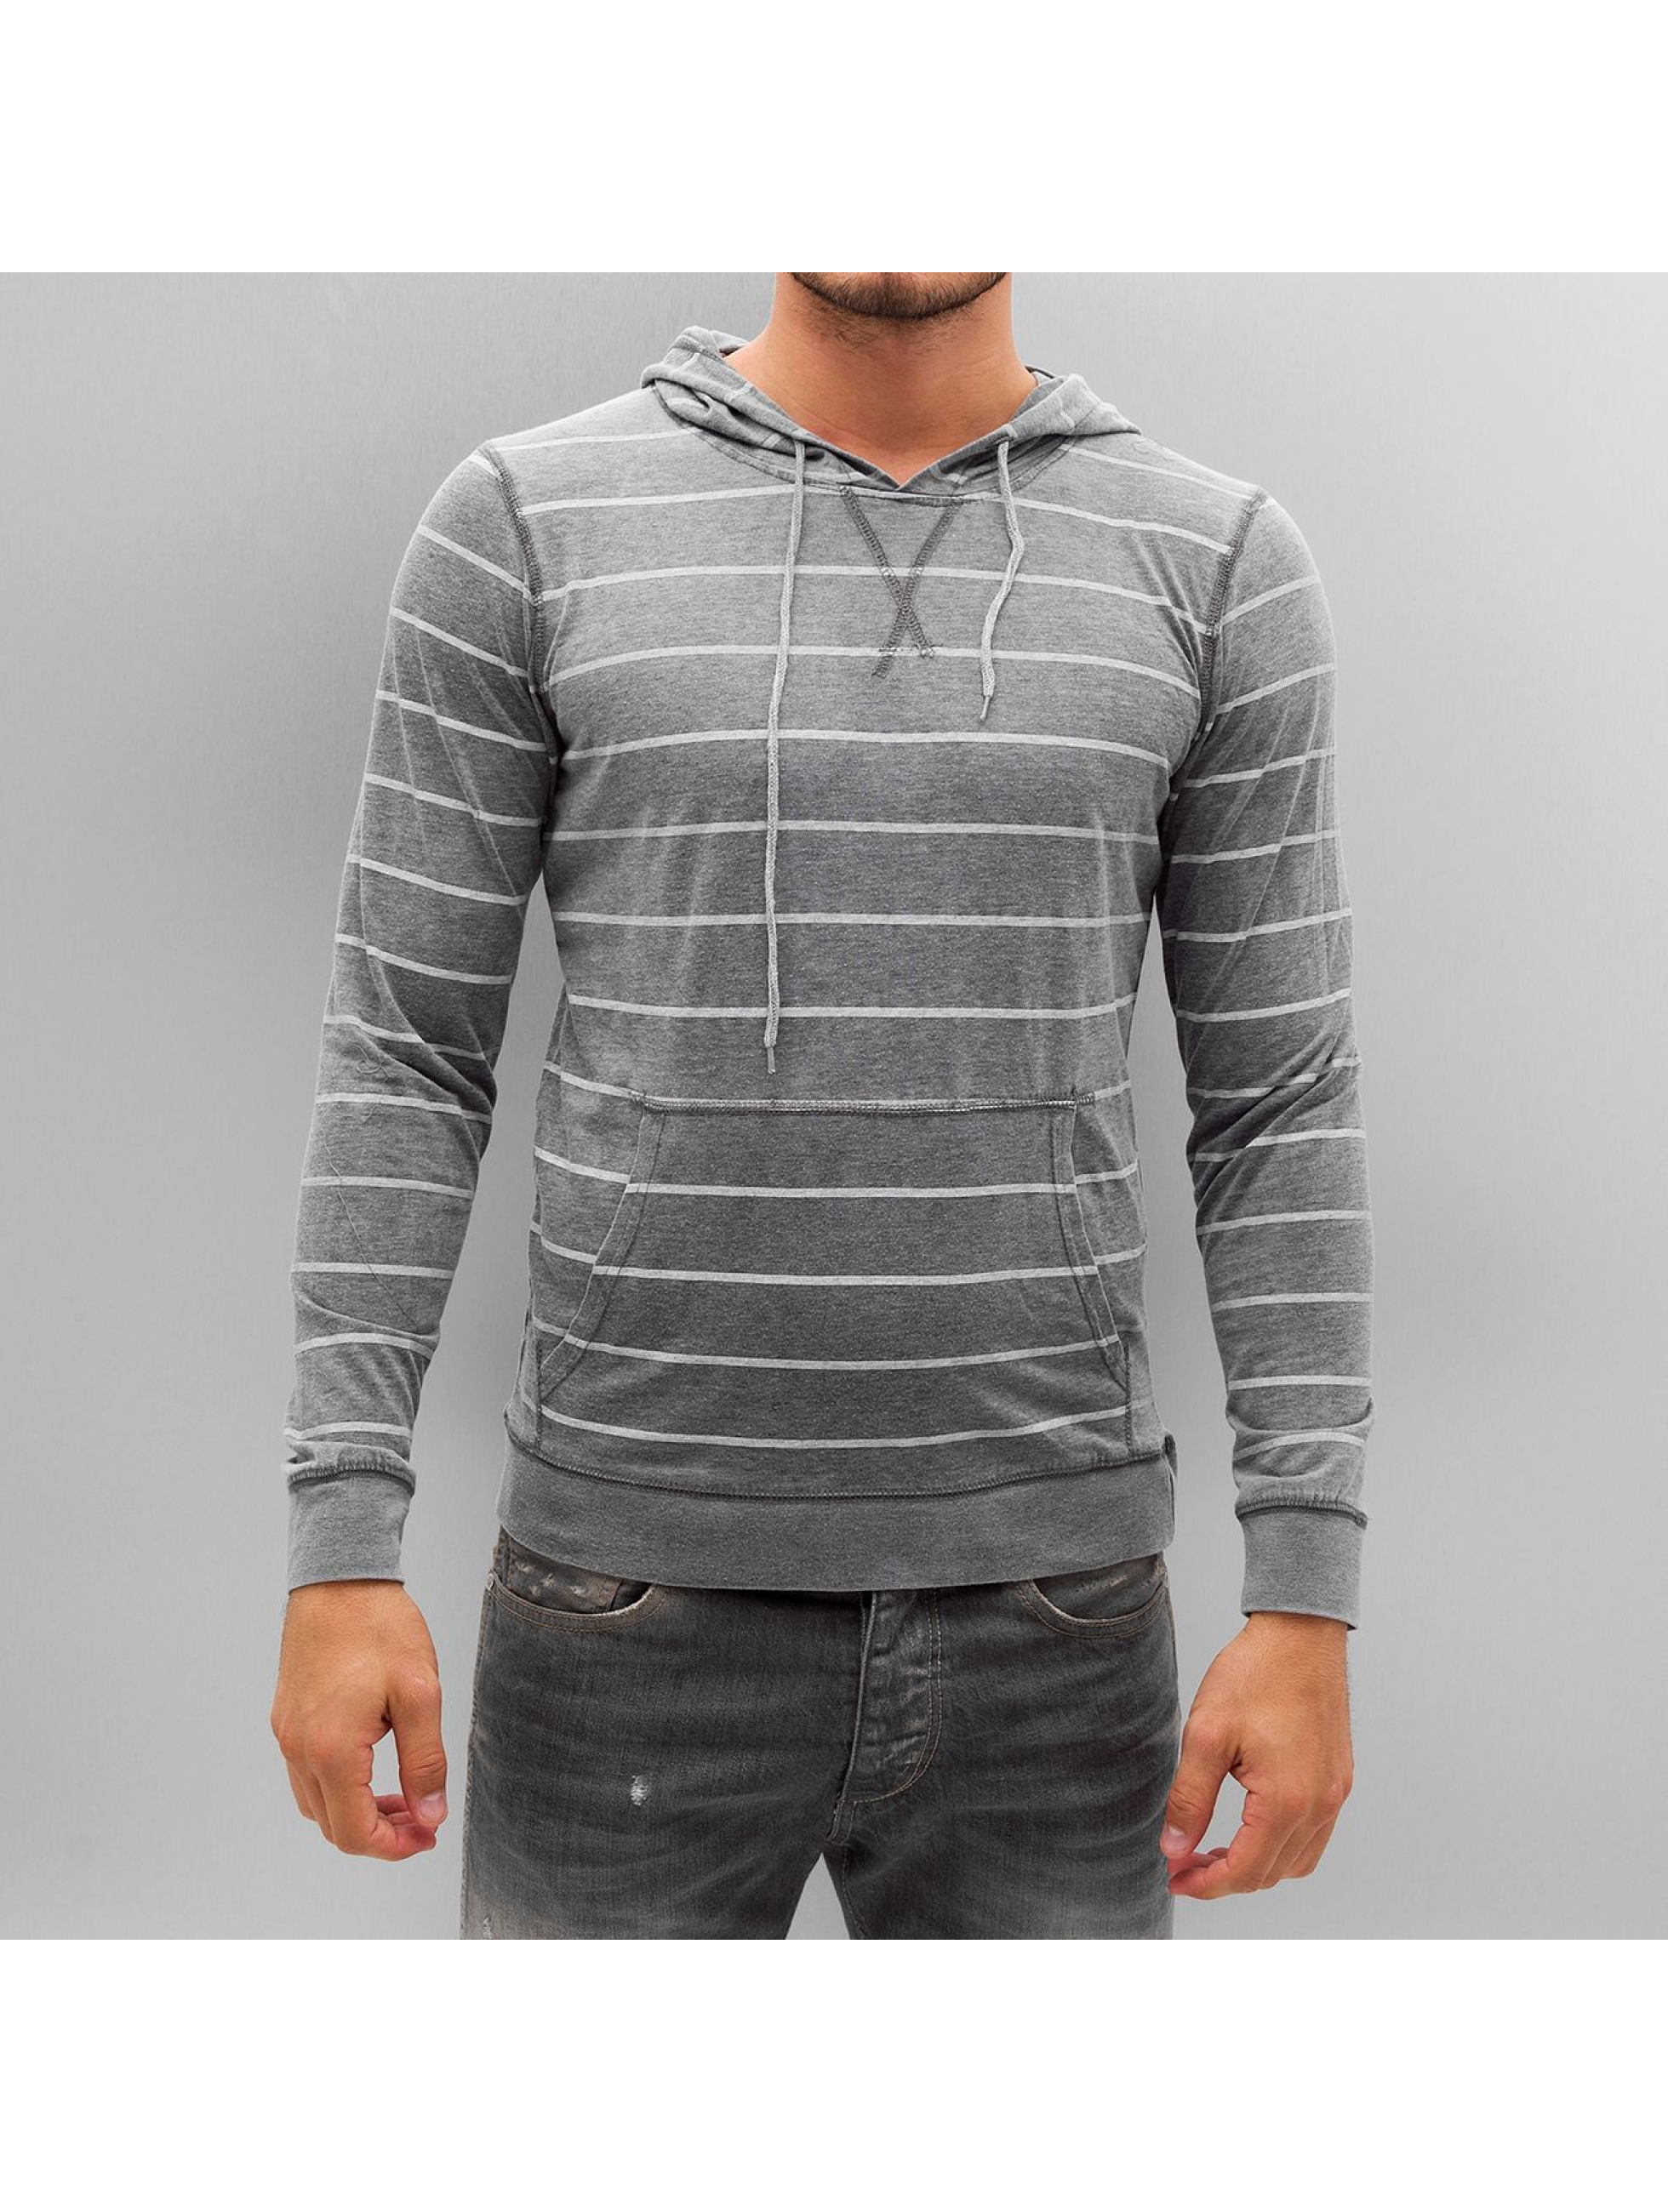 Urban Classics Hoody Striped Burnout grau